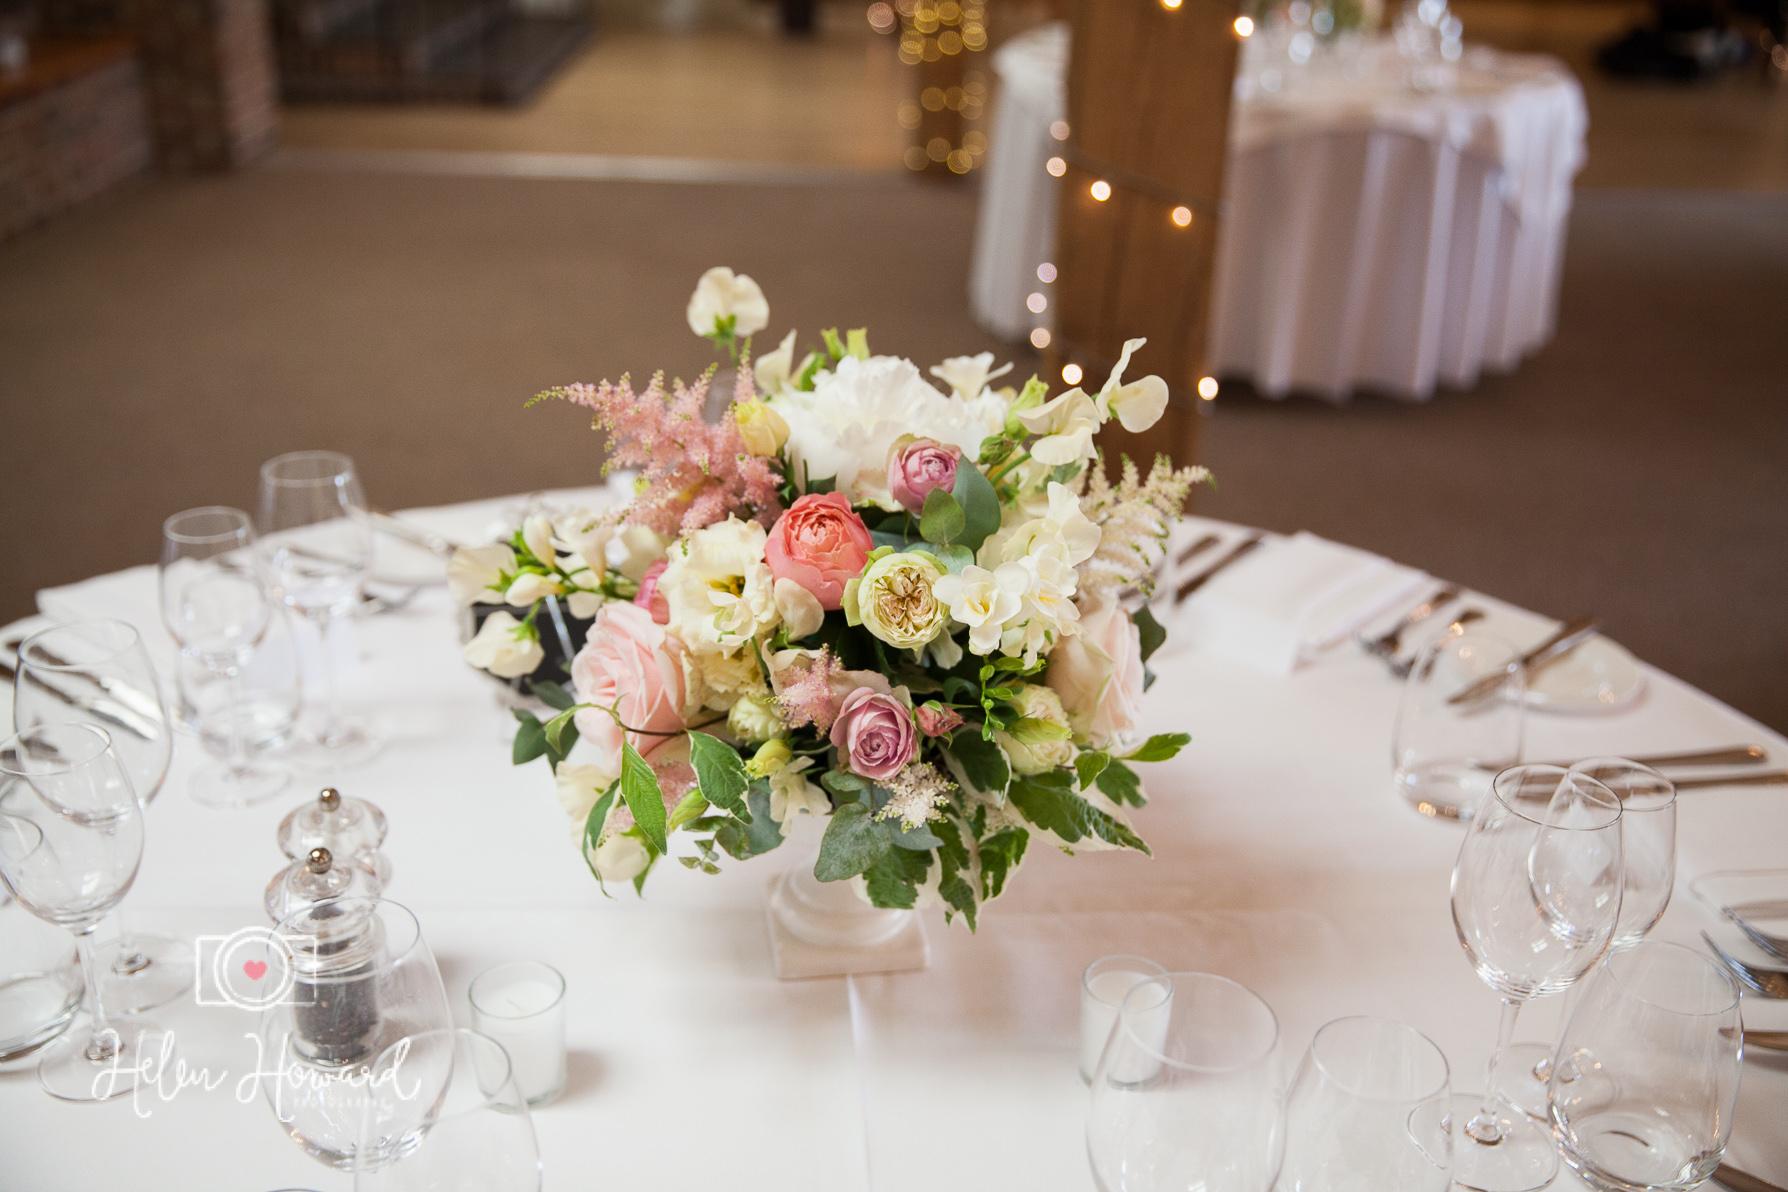 Helen Howard Photography Packington Moor Wedding-24.jpg